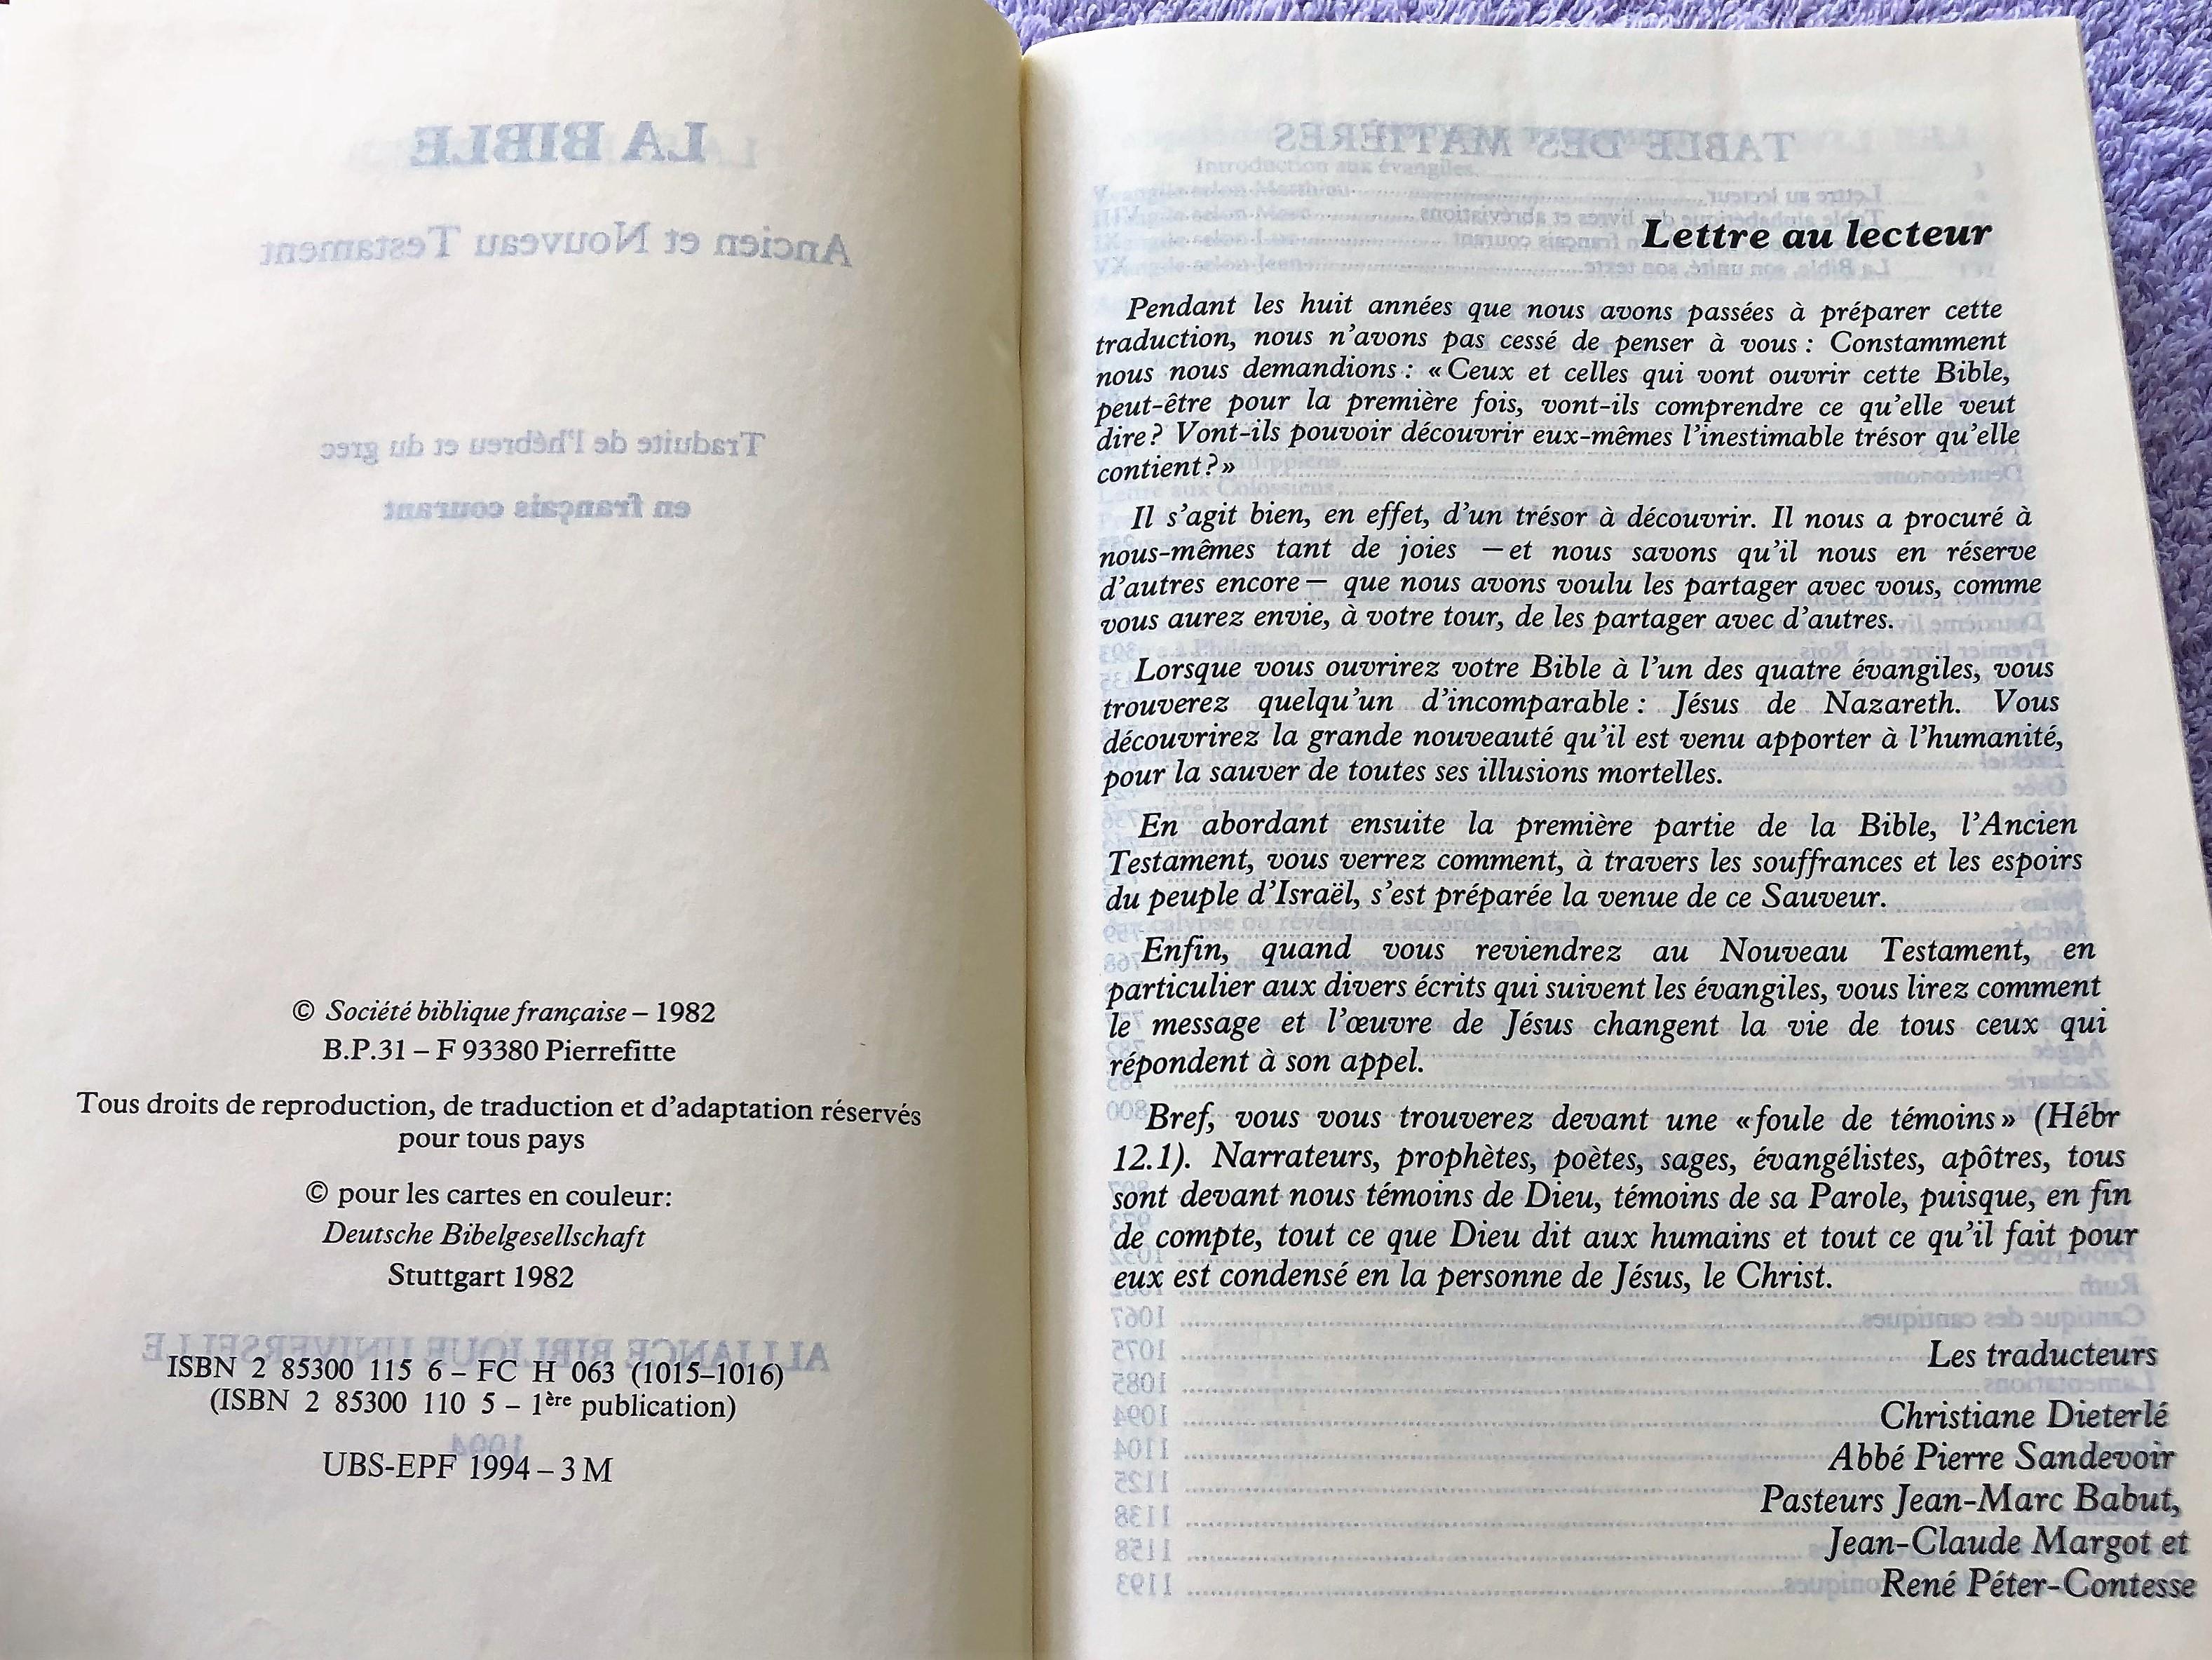 french-bible-1994-print-fch063-6-.jpg